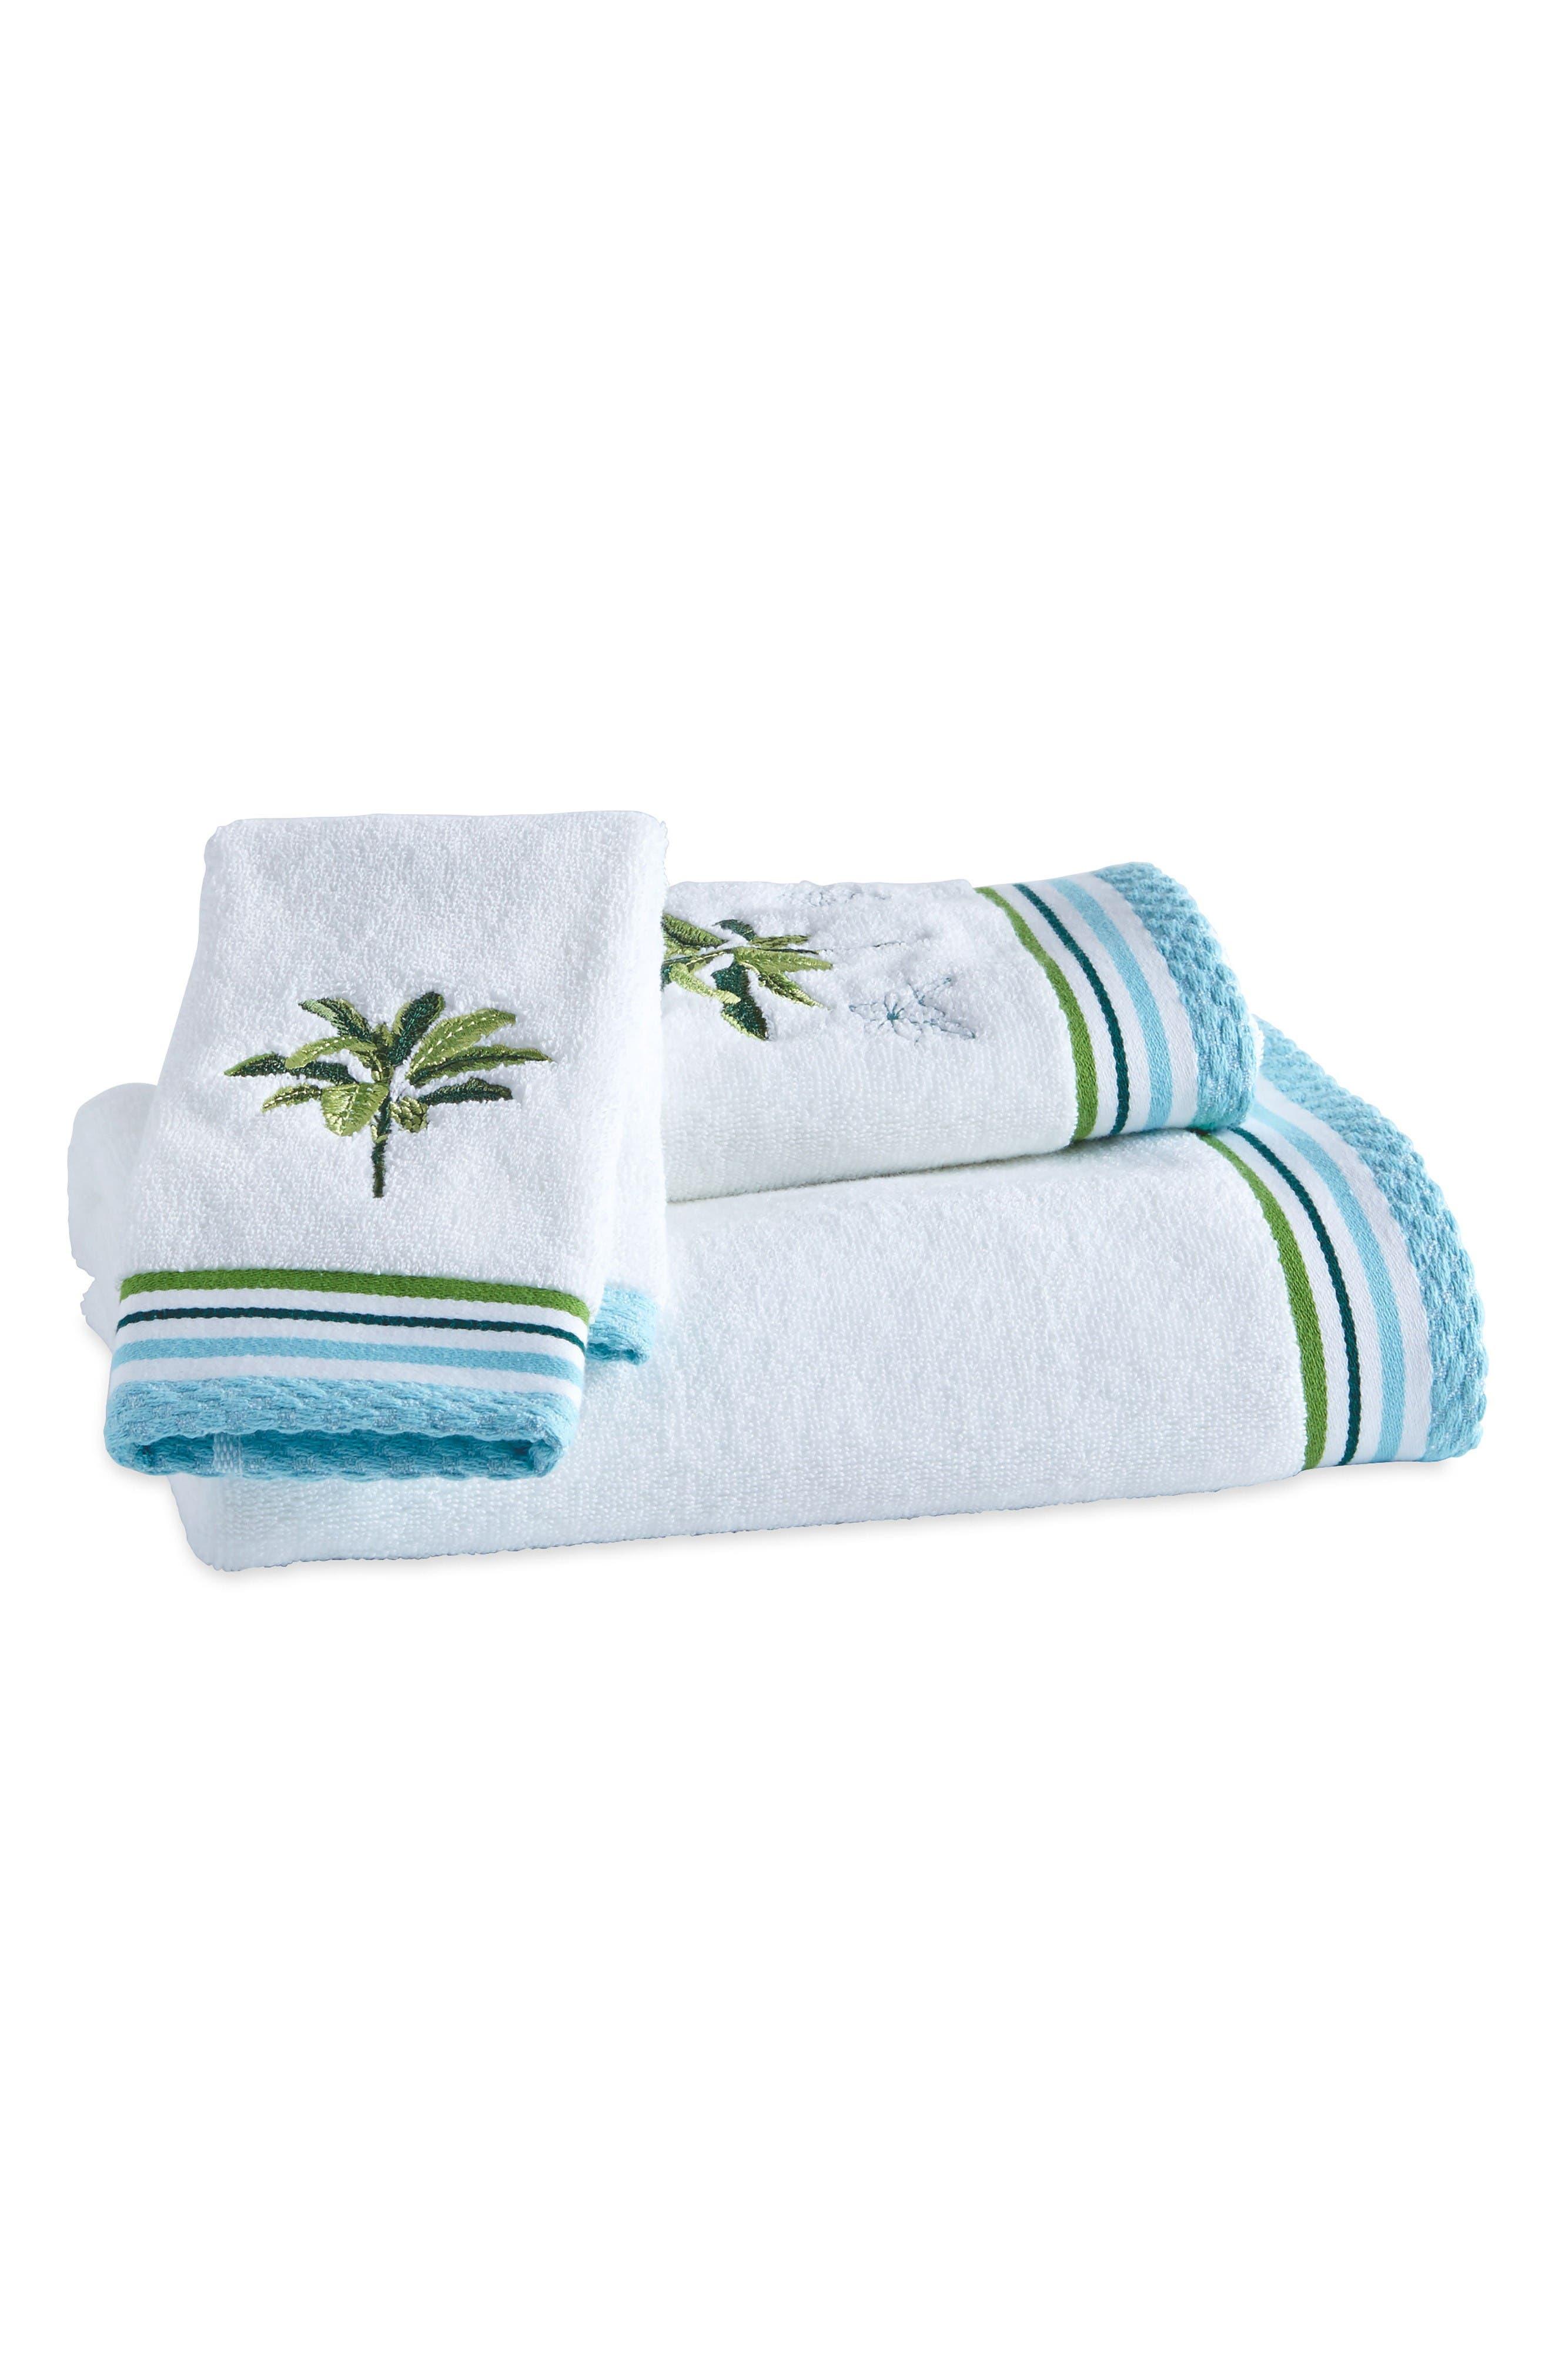 Alternate Image 1 Selected - Destinations Tropical Palm Bath Towel, Hand Towel and Washcloth Set